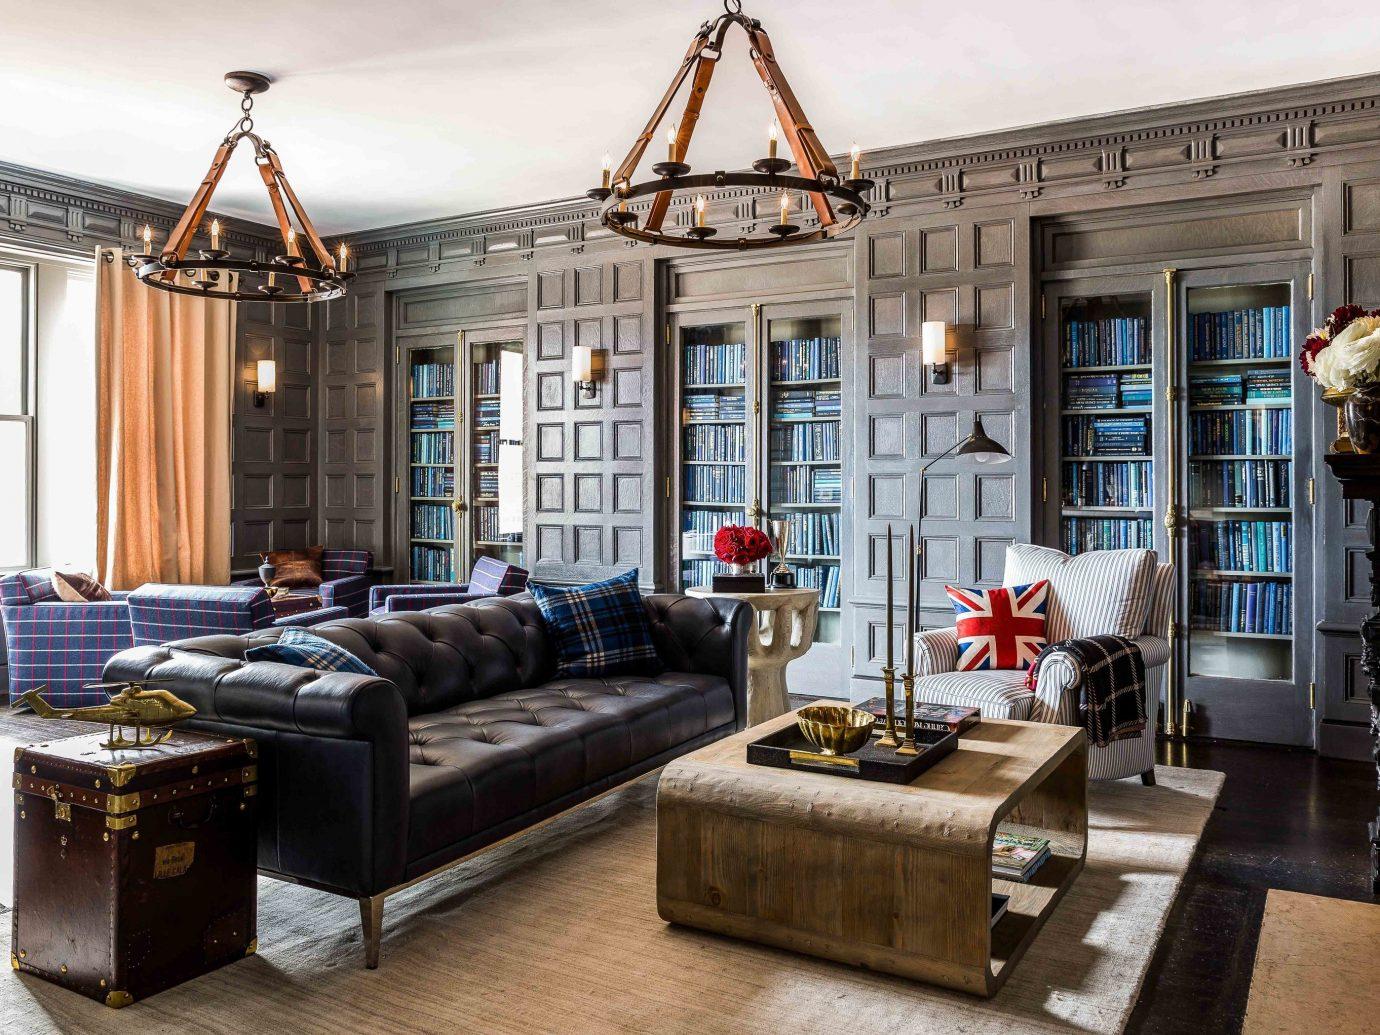 Boutique Hotels Hotels Influencers + Tastemakers Romantic Hotels Style + Design living room interior design home window loft